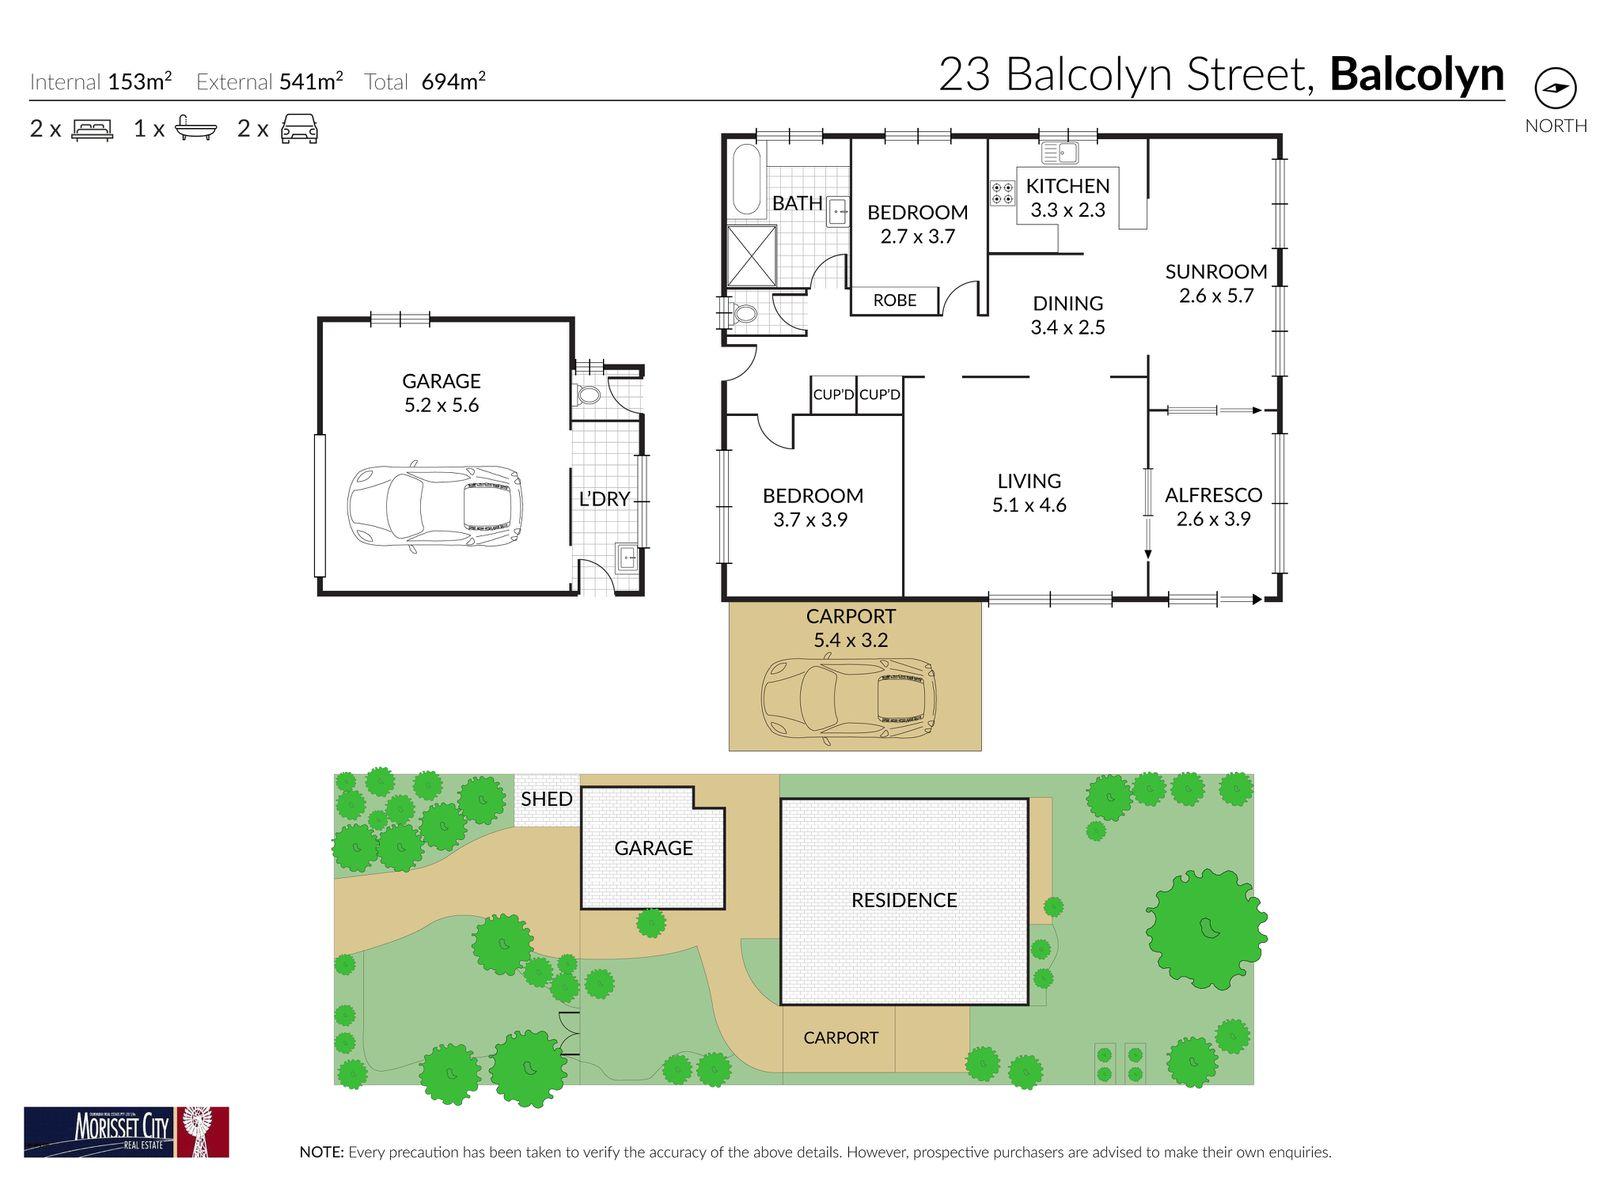 23 Balcolyn Street, Balcolyn